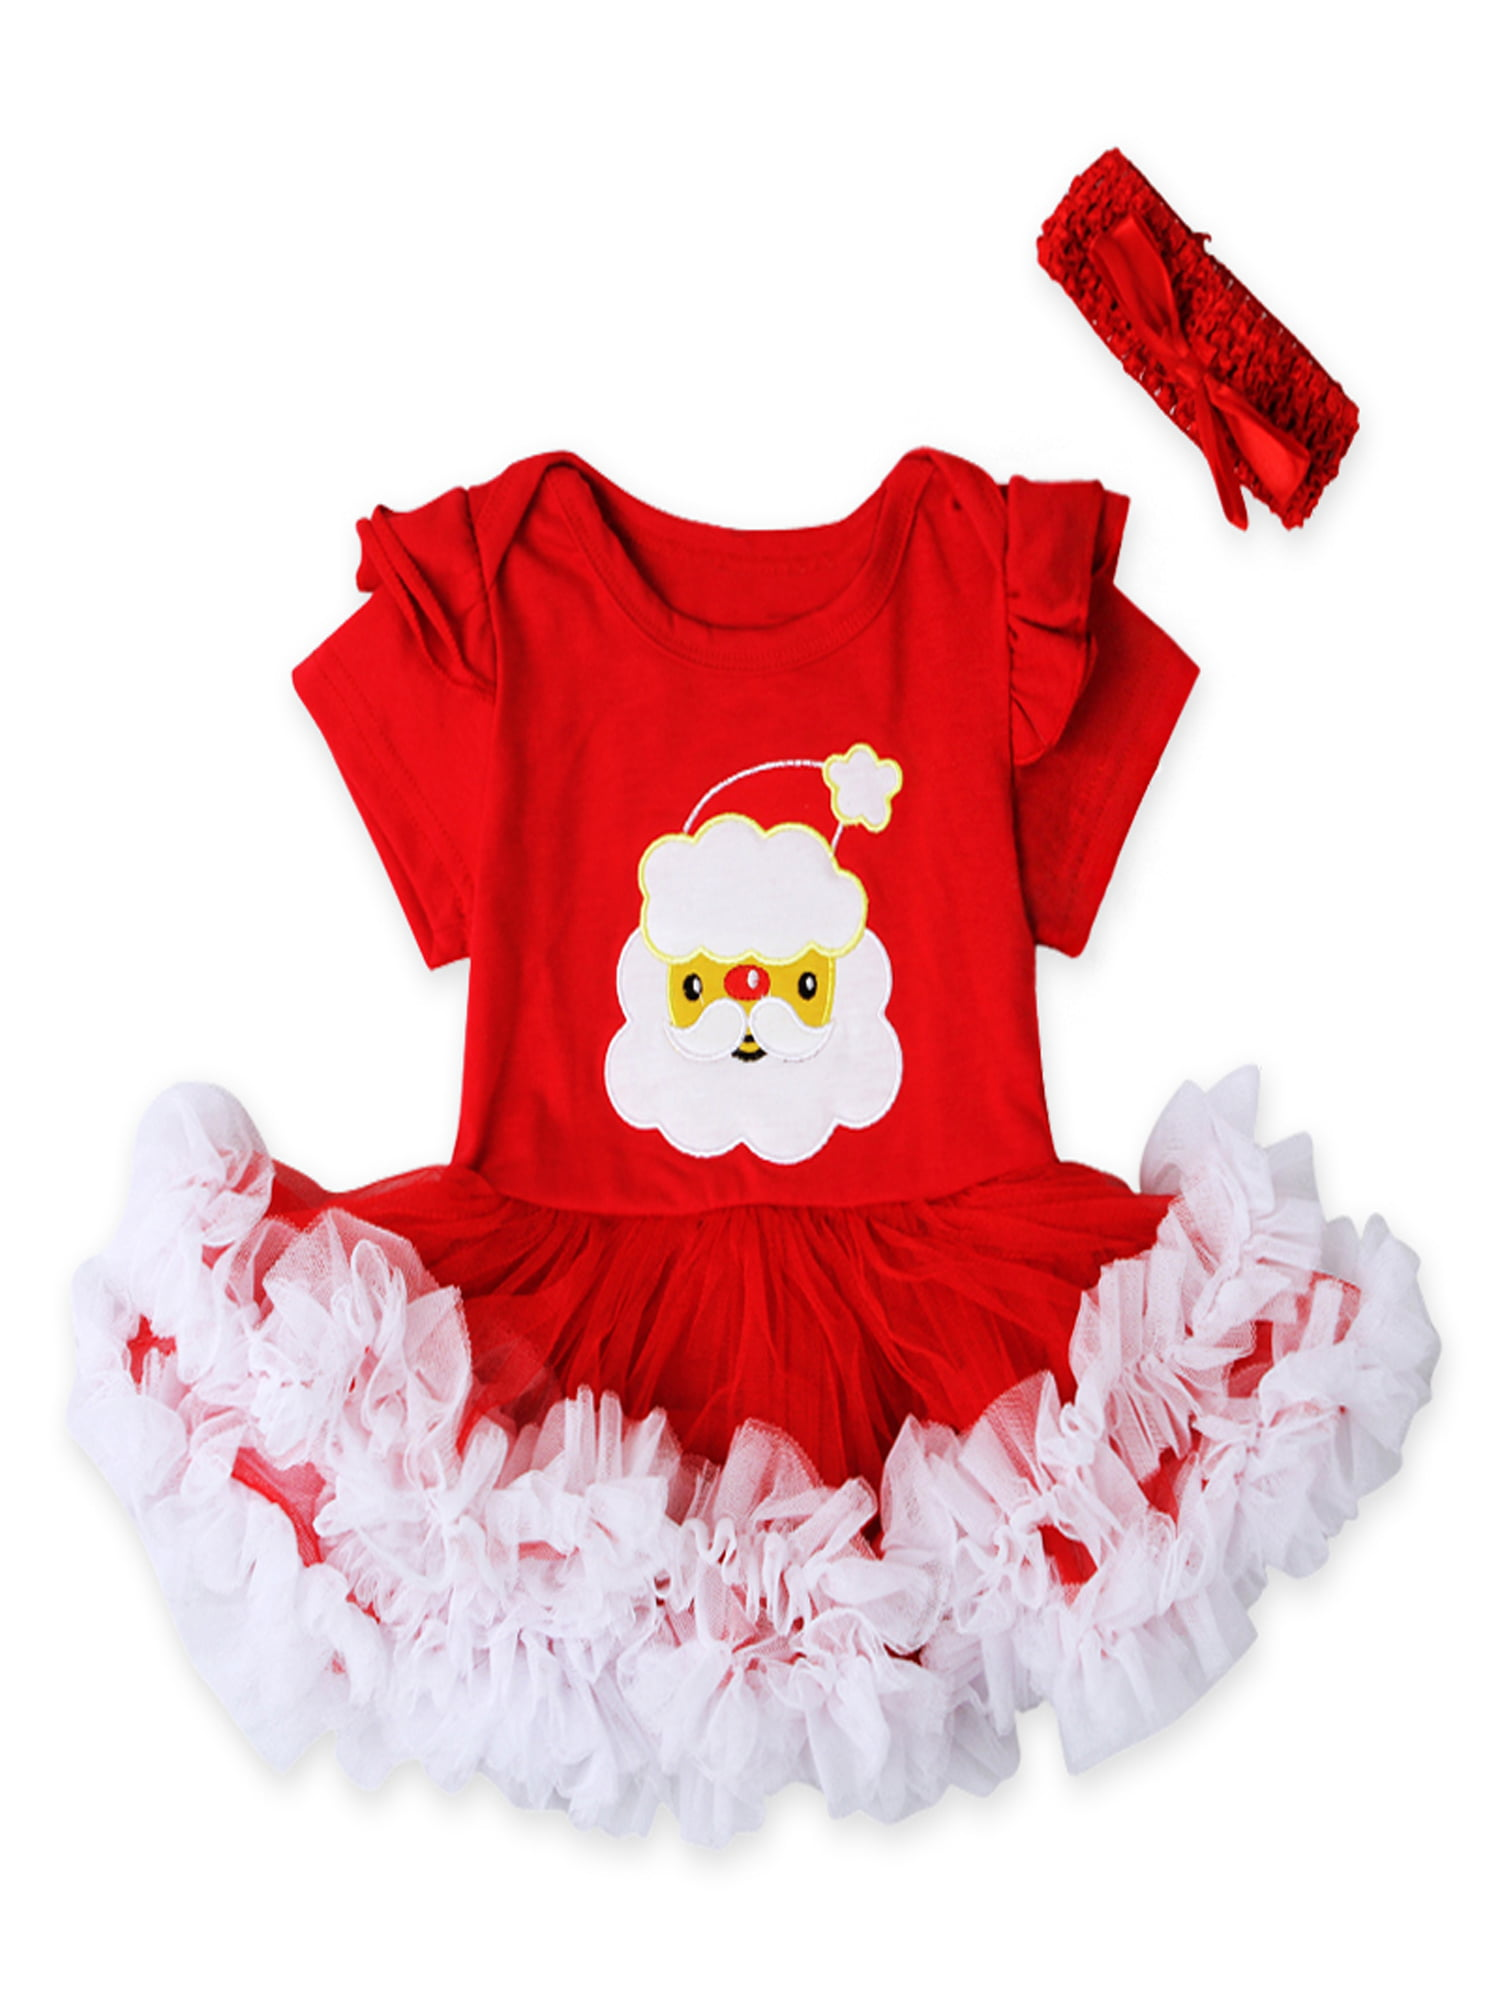 Newborn Infant Baby Girl Christmas Tree Romper Tops Tutu Skirt Xmas 2PCS Outfits Clothes Set